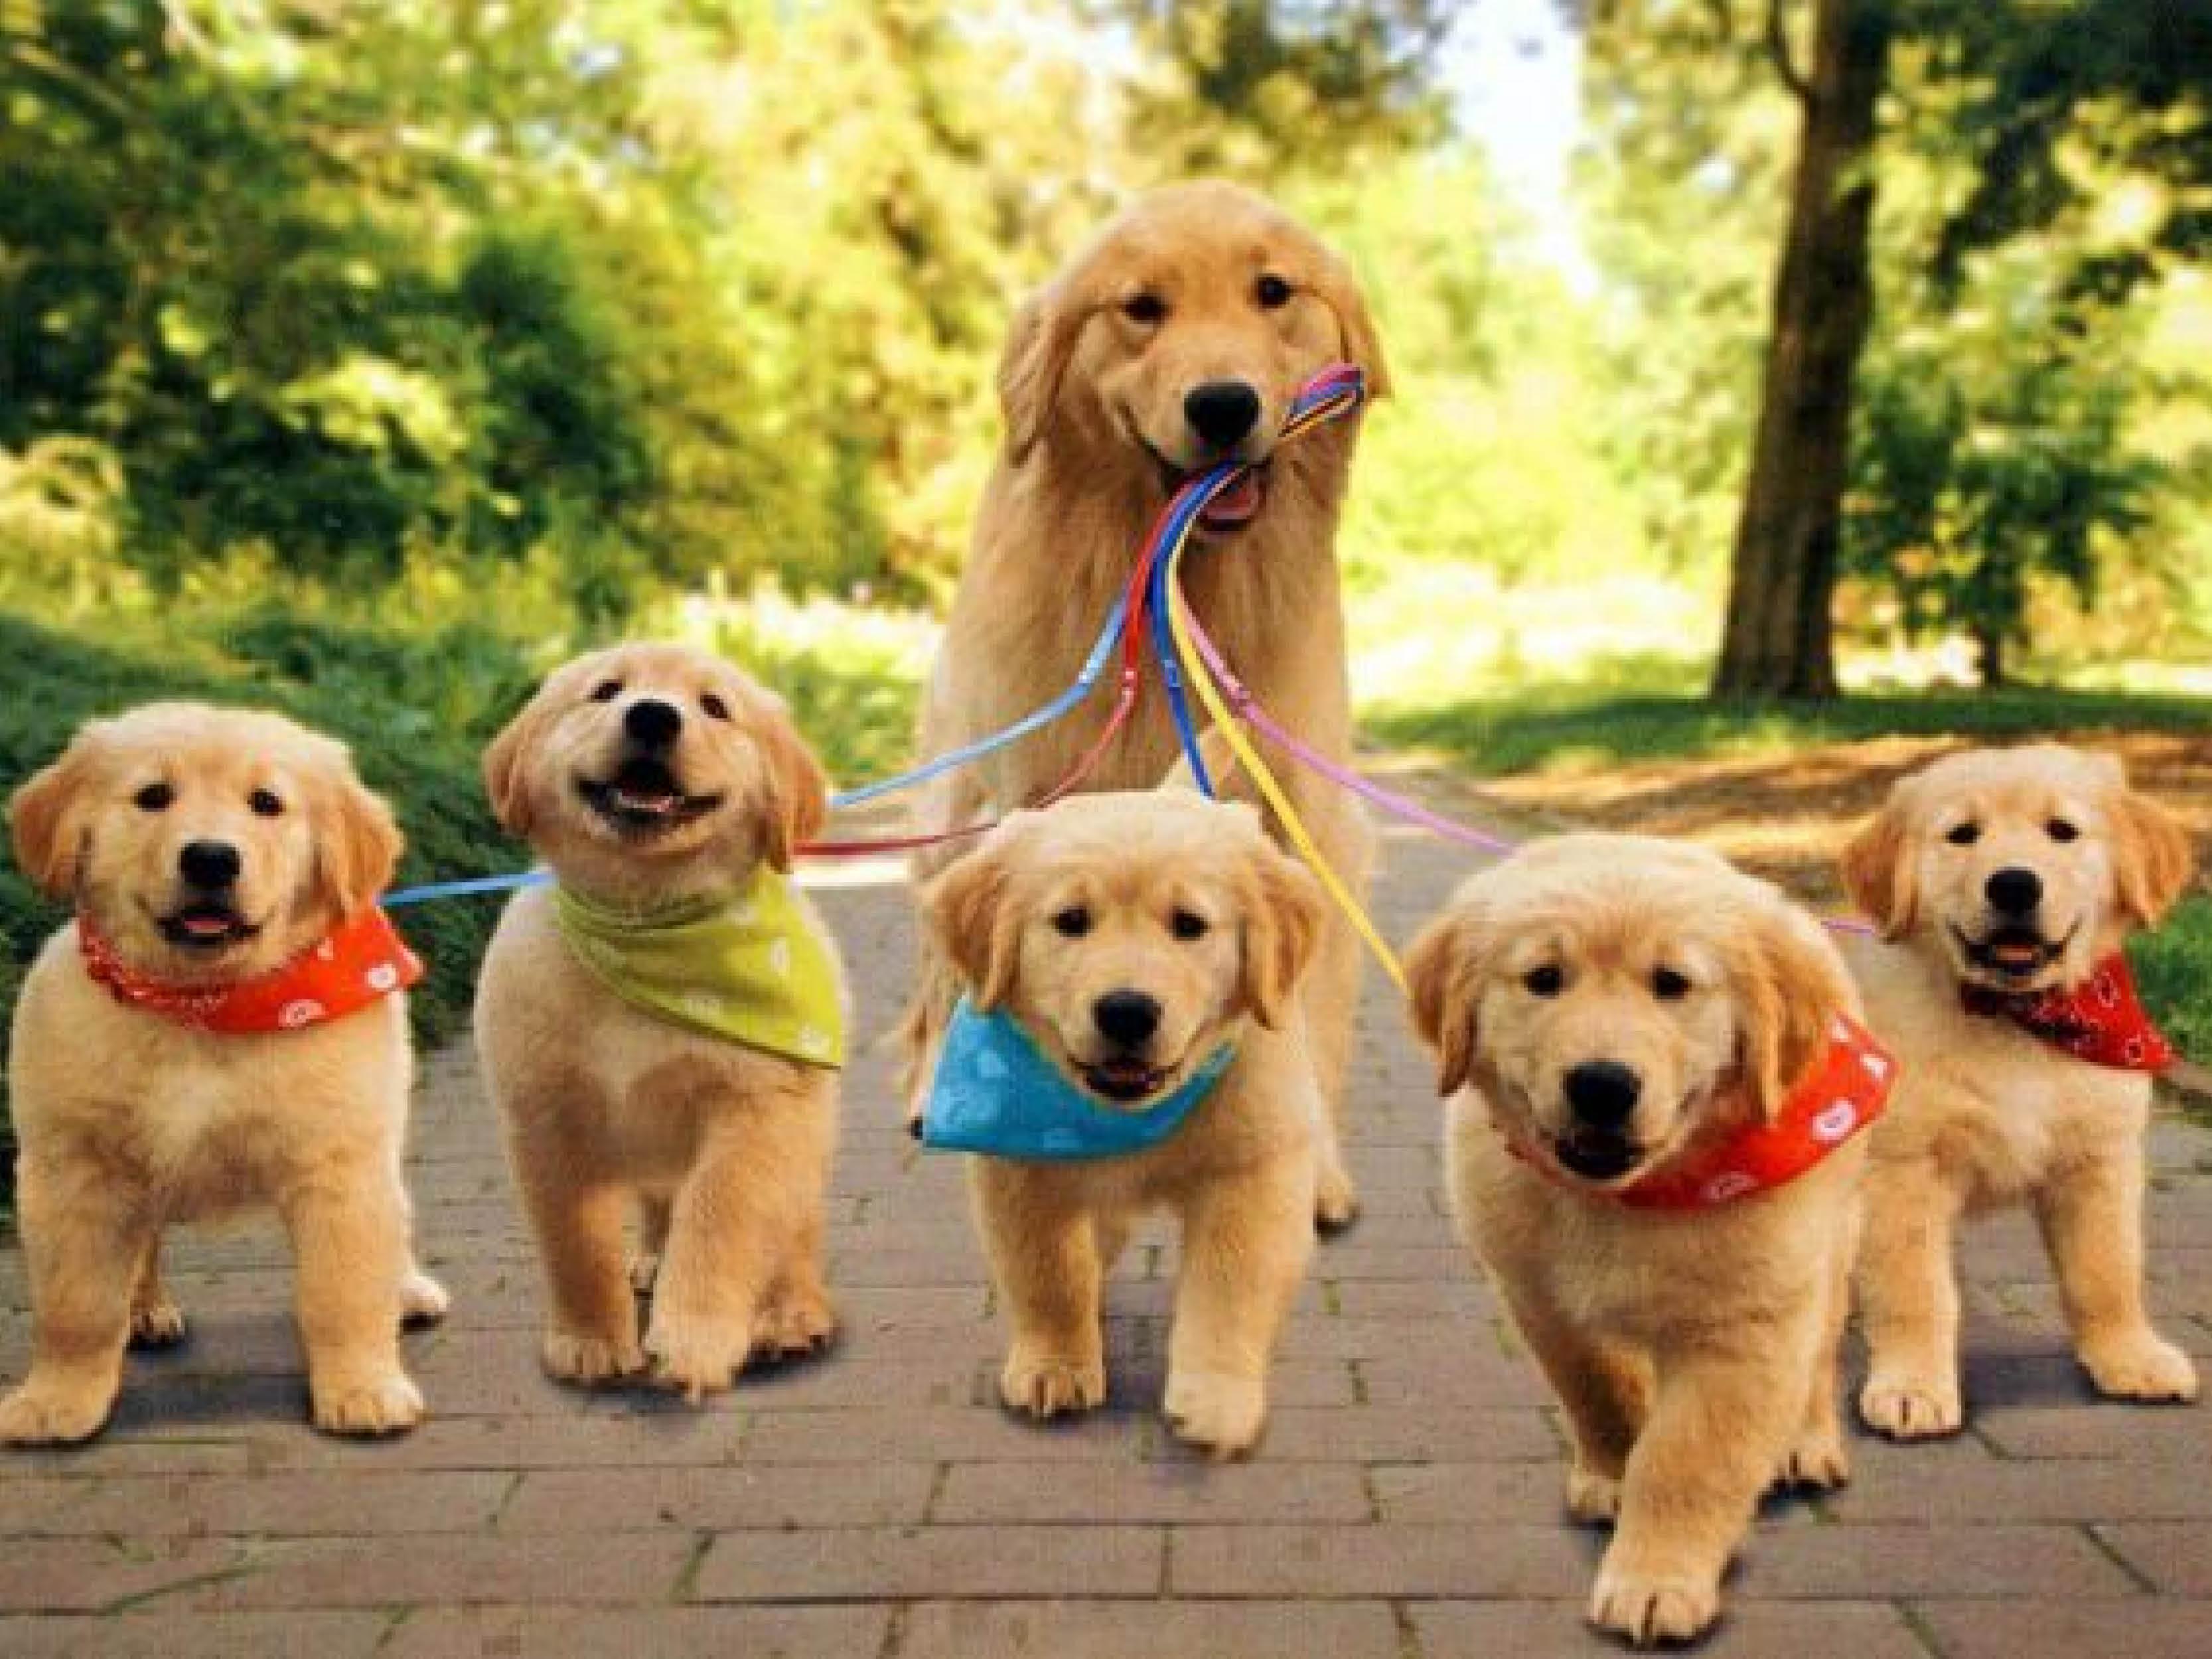 http://assets.boxdice.com.au/laguna/attachments/8f9/0ca/dogs.jpg?fb00c42d8d25800d029353bc9559d76b